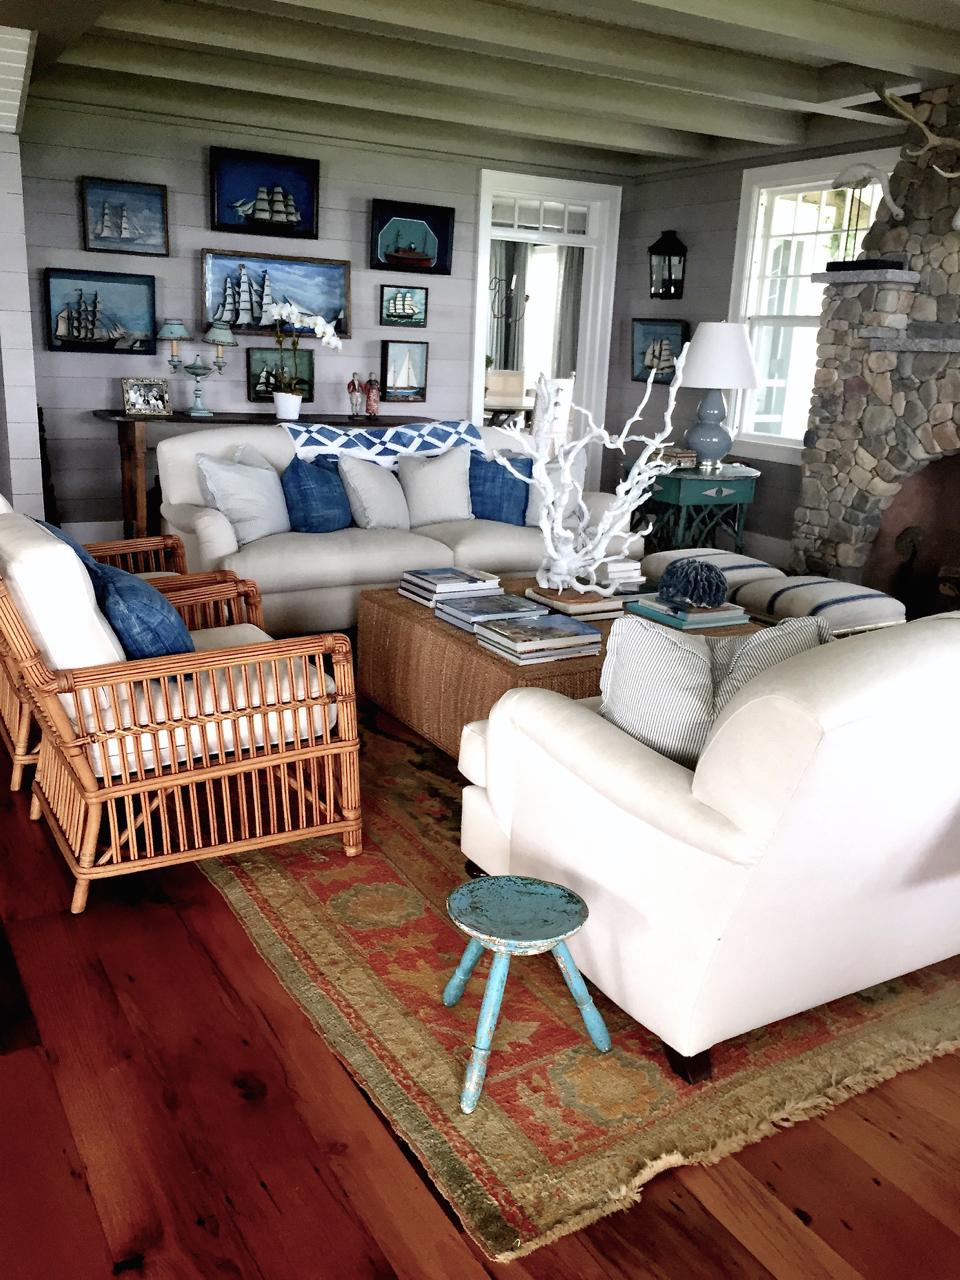 Nantucket House Tour | Stylish in Sconset - Quintessence